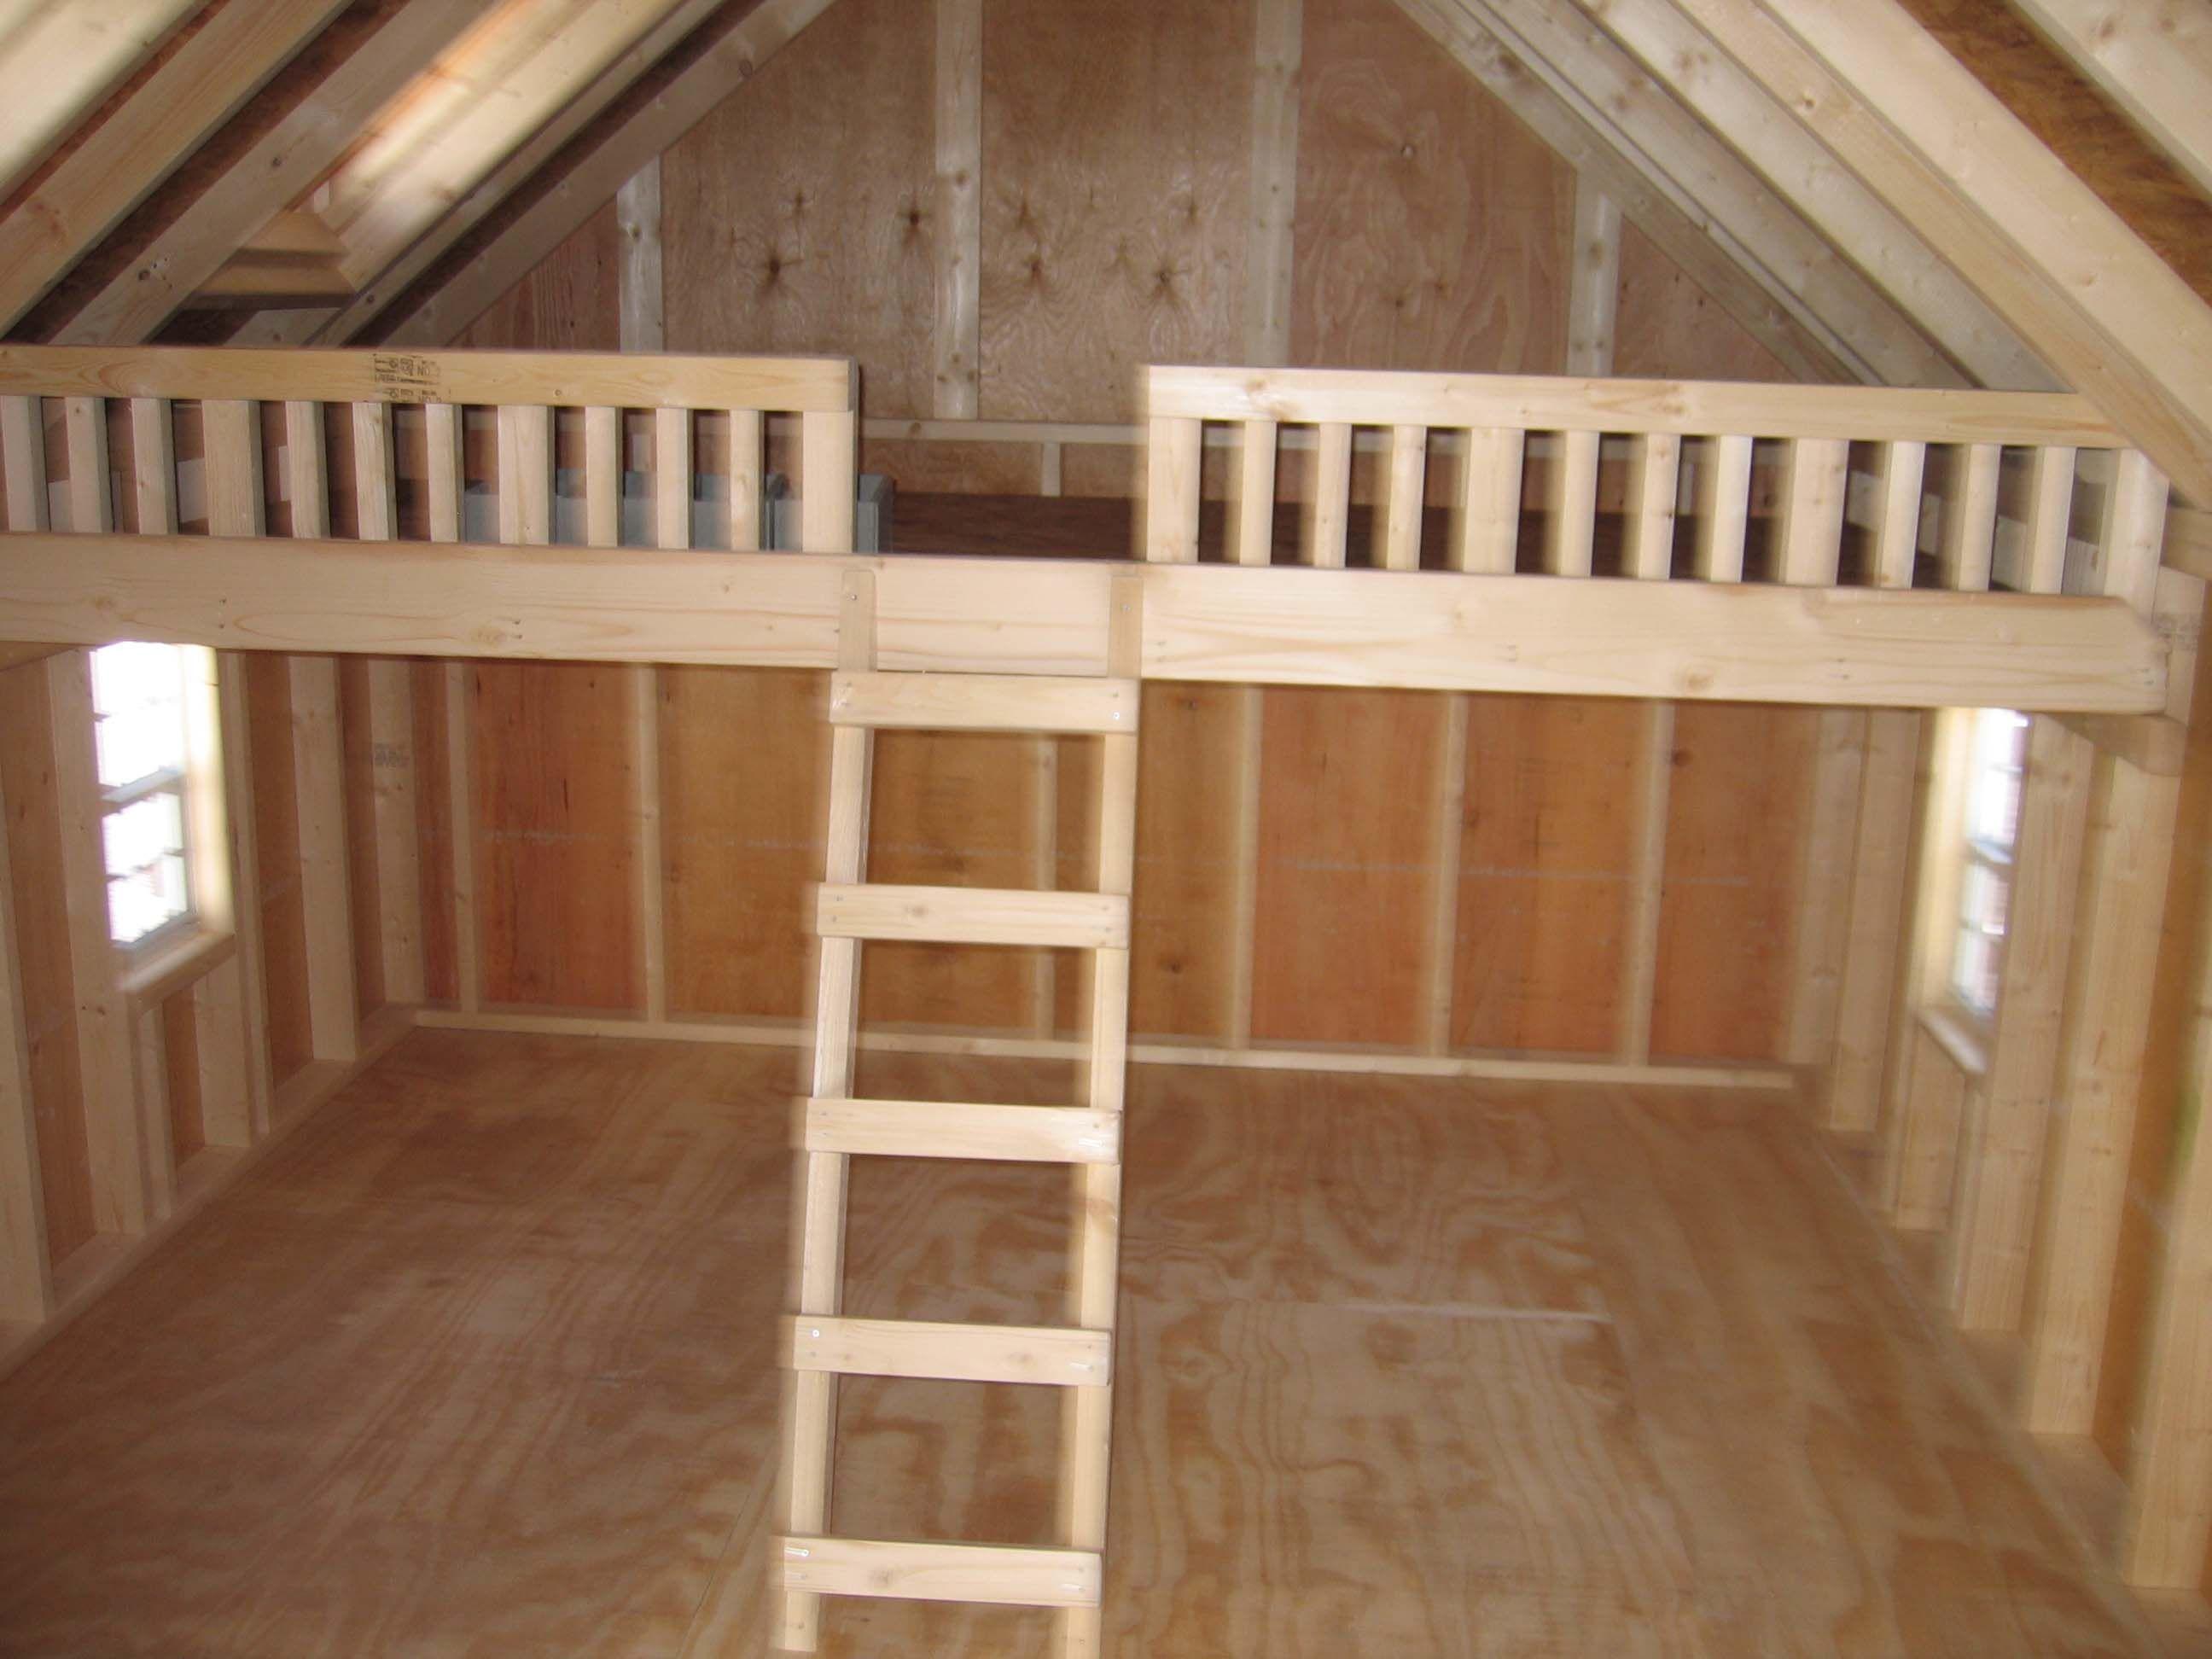 Playhouse Plans With Loft Kids